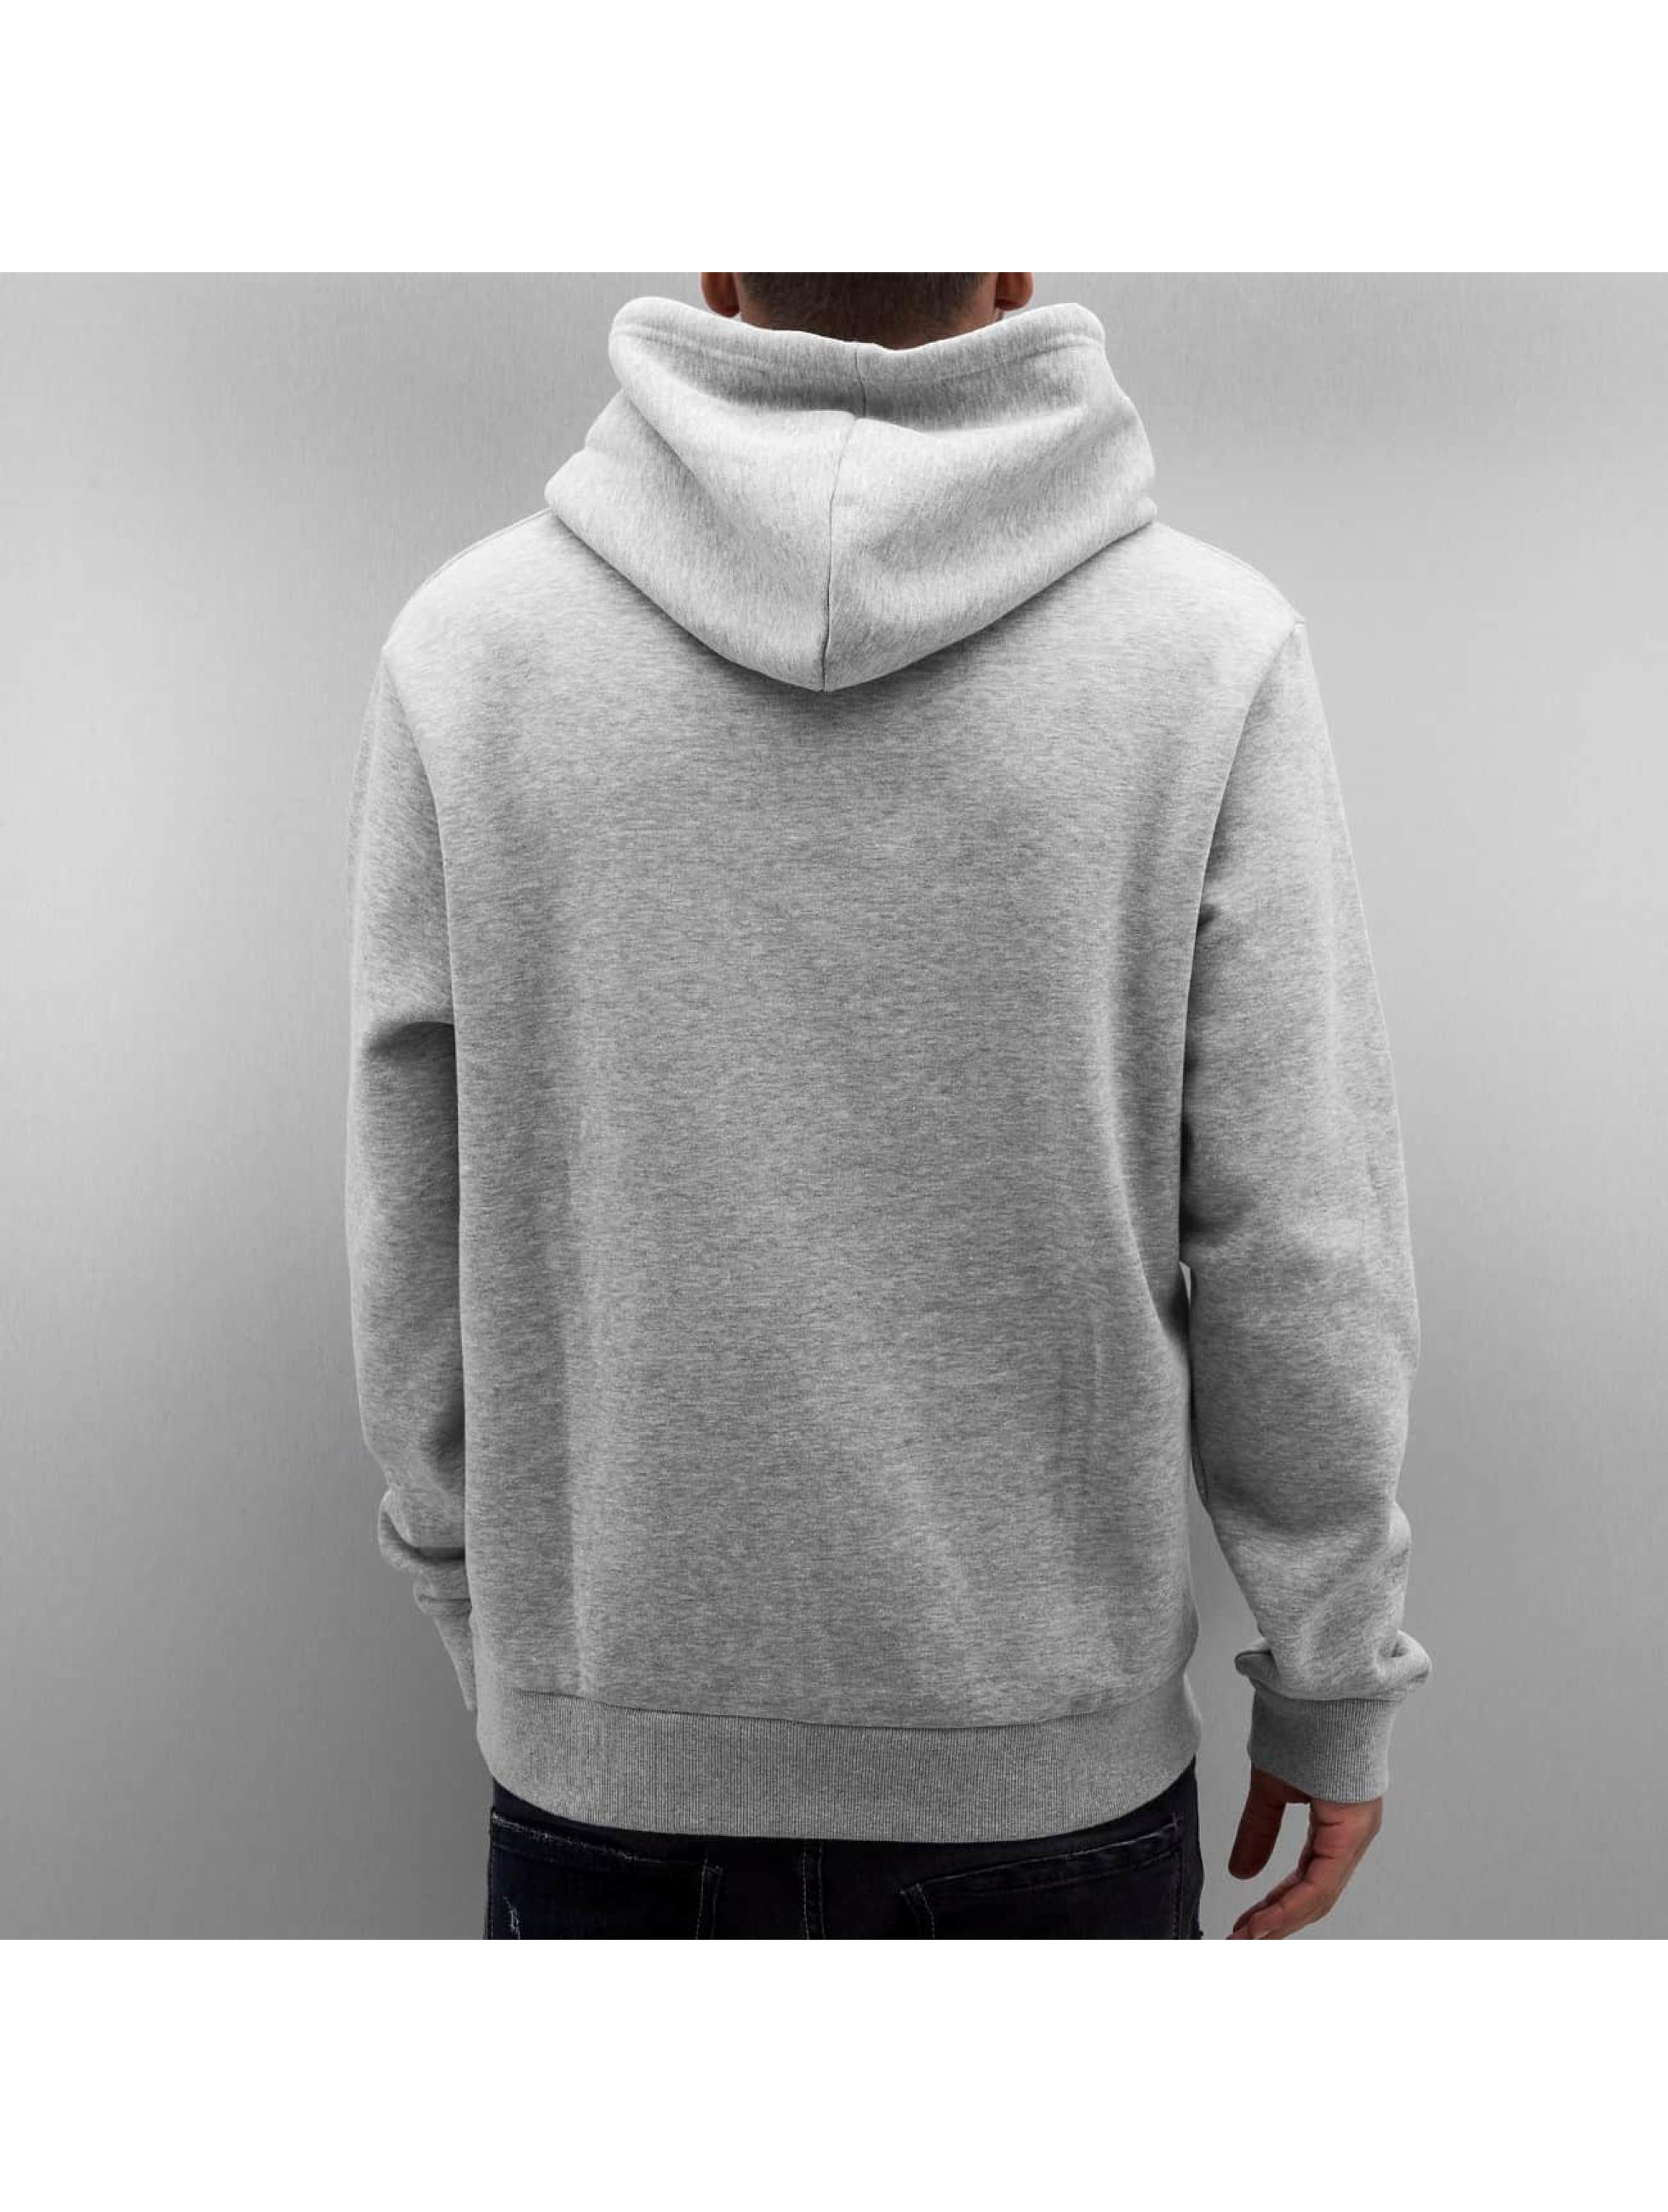 Rocawear Hoodie Fleece gray